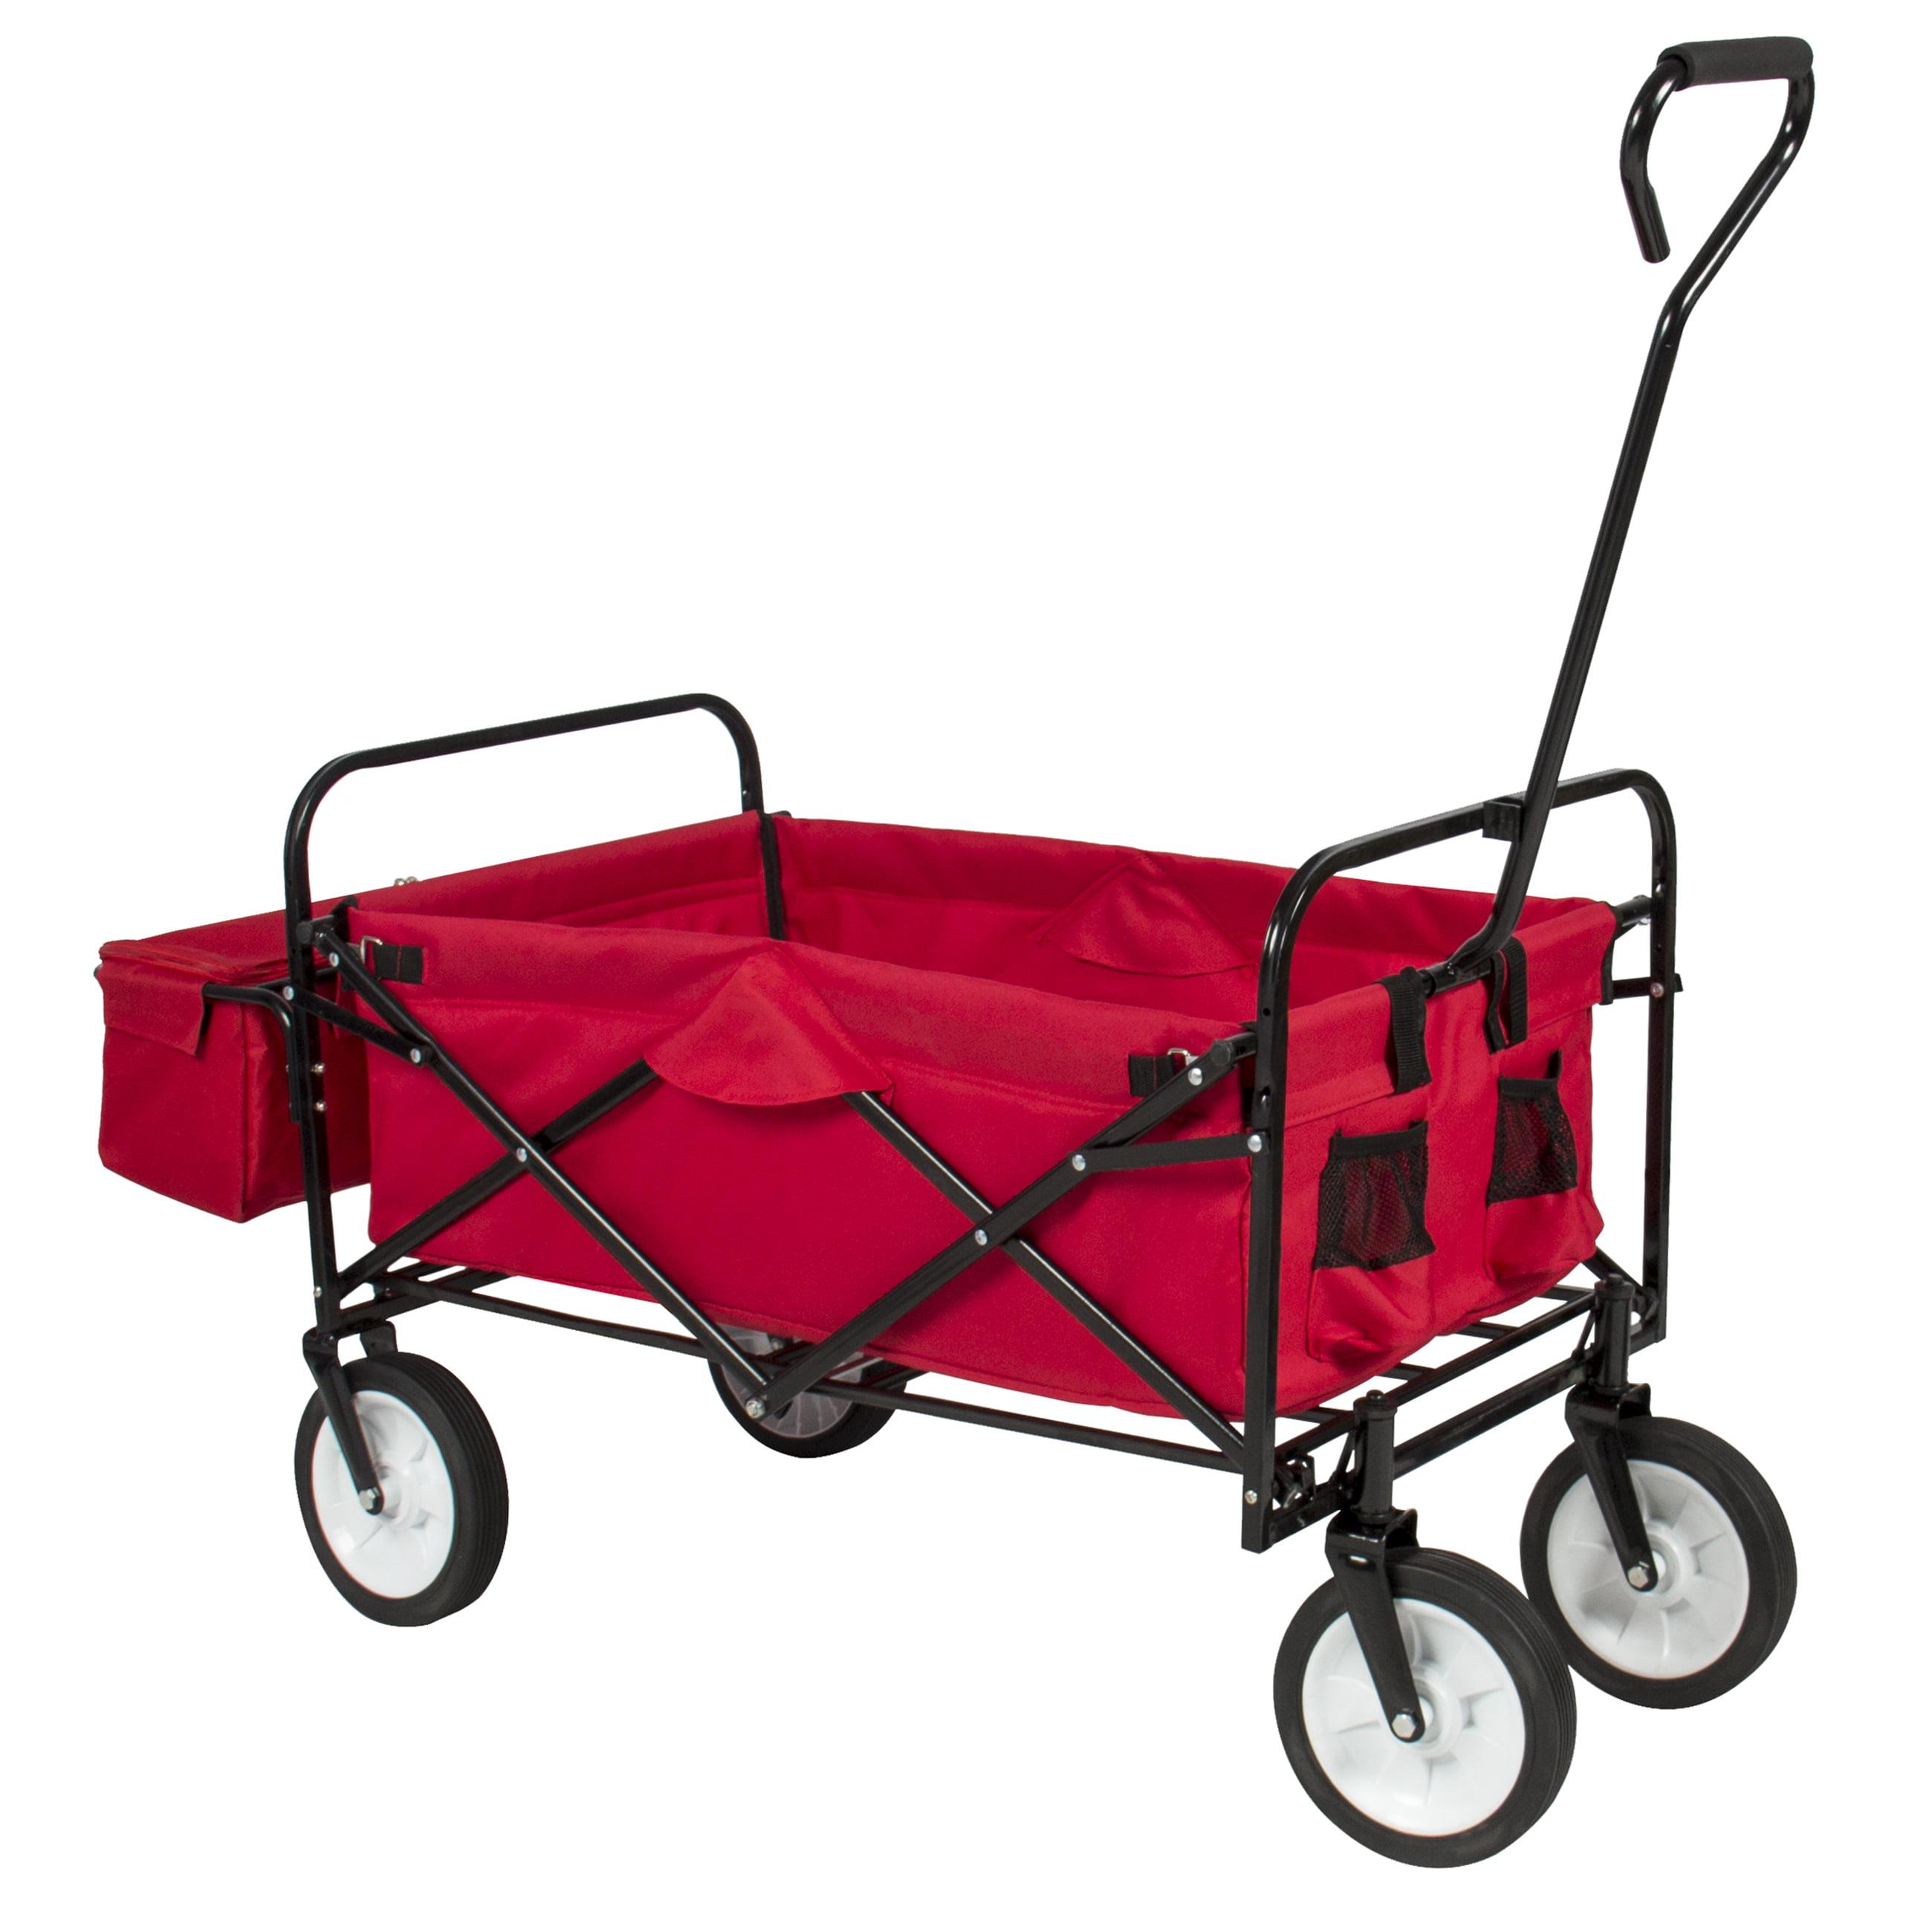 Delightful Folding Wagon W/ Canopy Garden Utility Travel Collapsible Cart Outdoor Yard  Home   Walmart.com